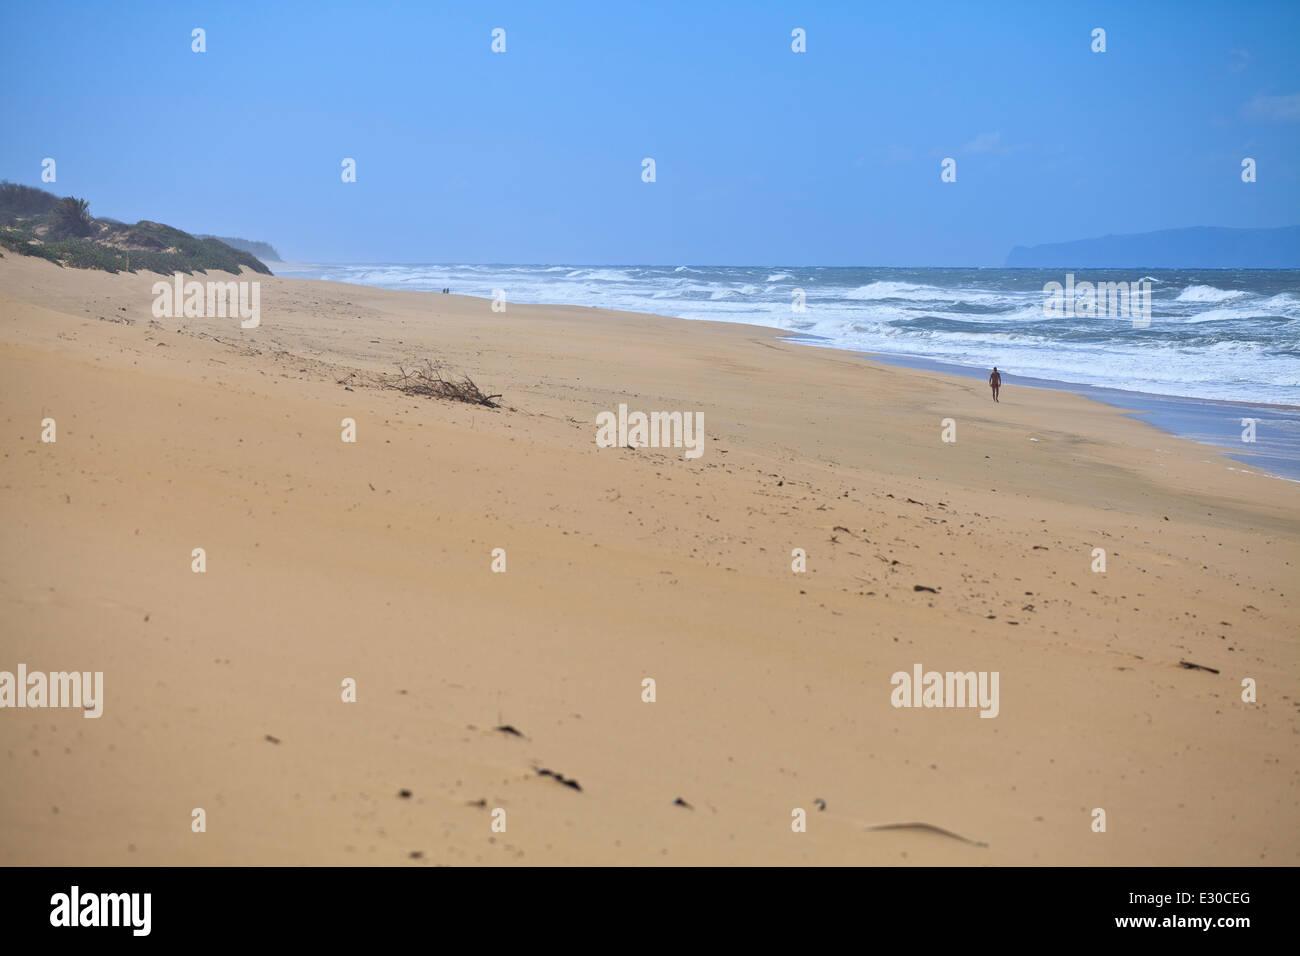 Barking Sands Beach, Kauai, Hawaii Stock Photo